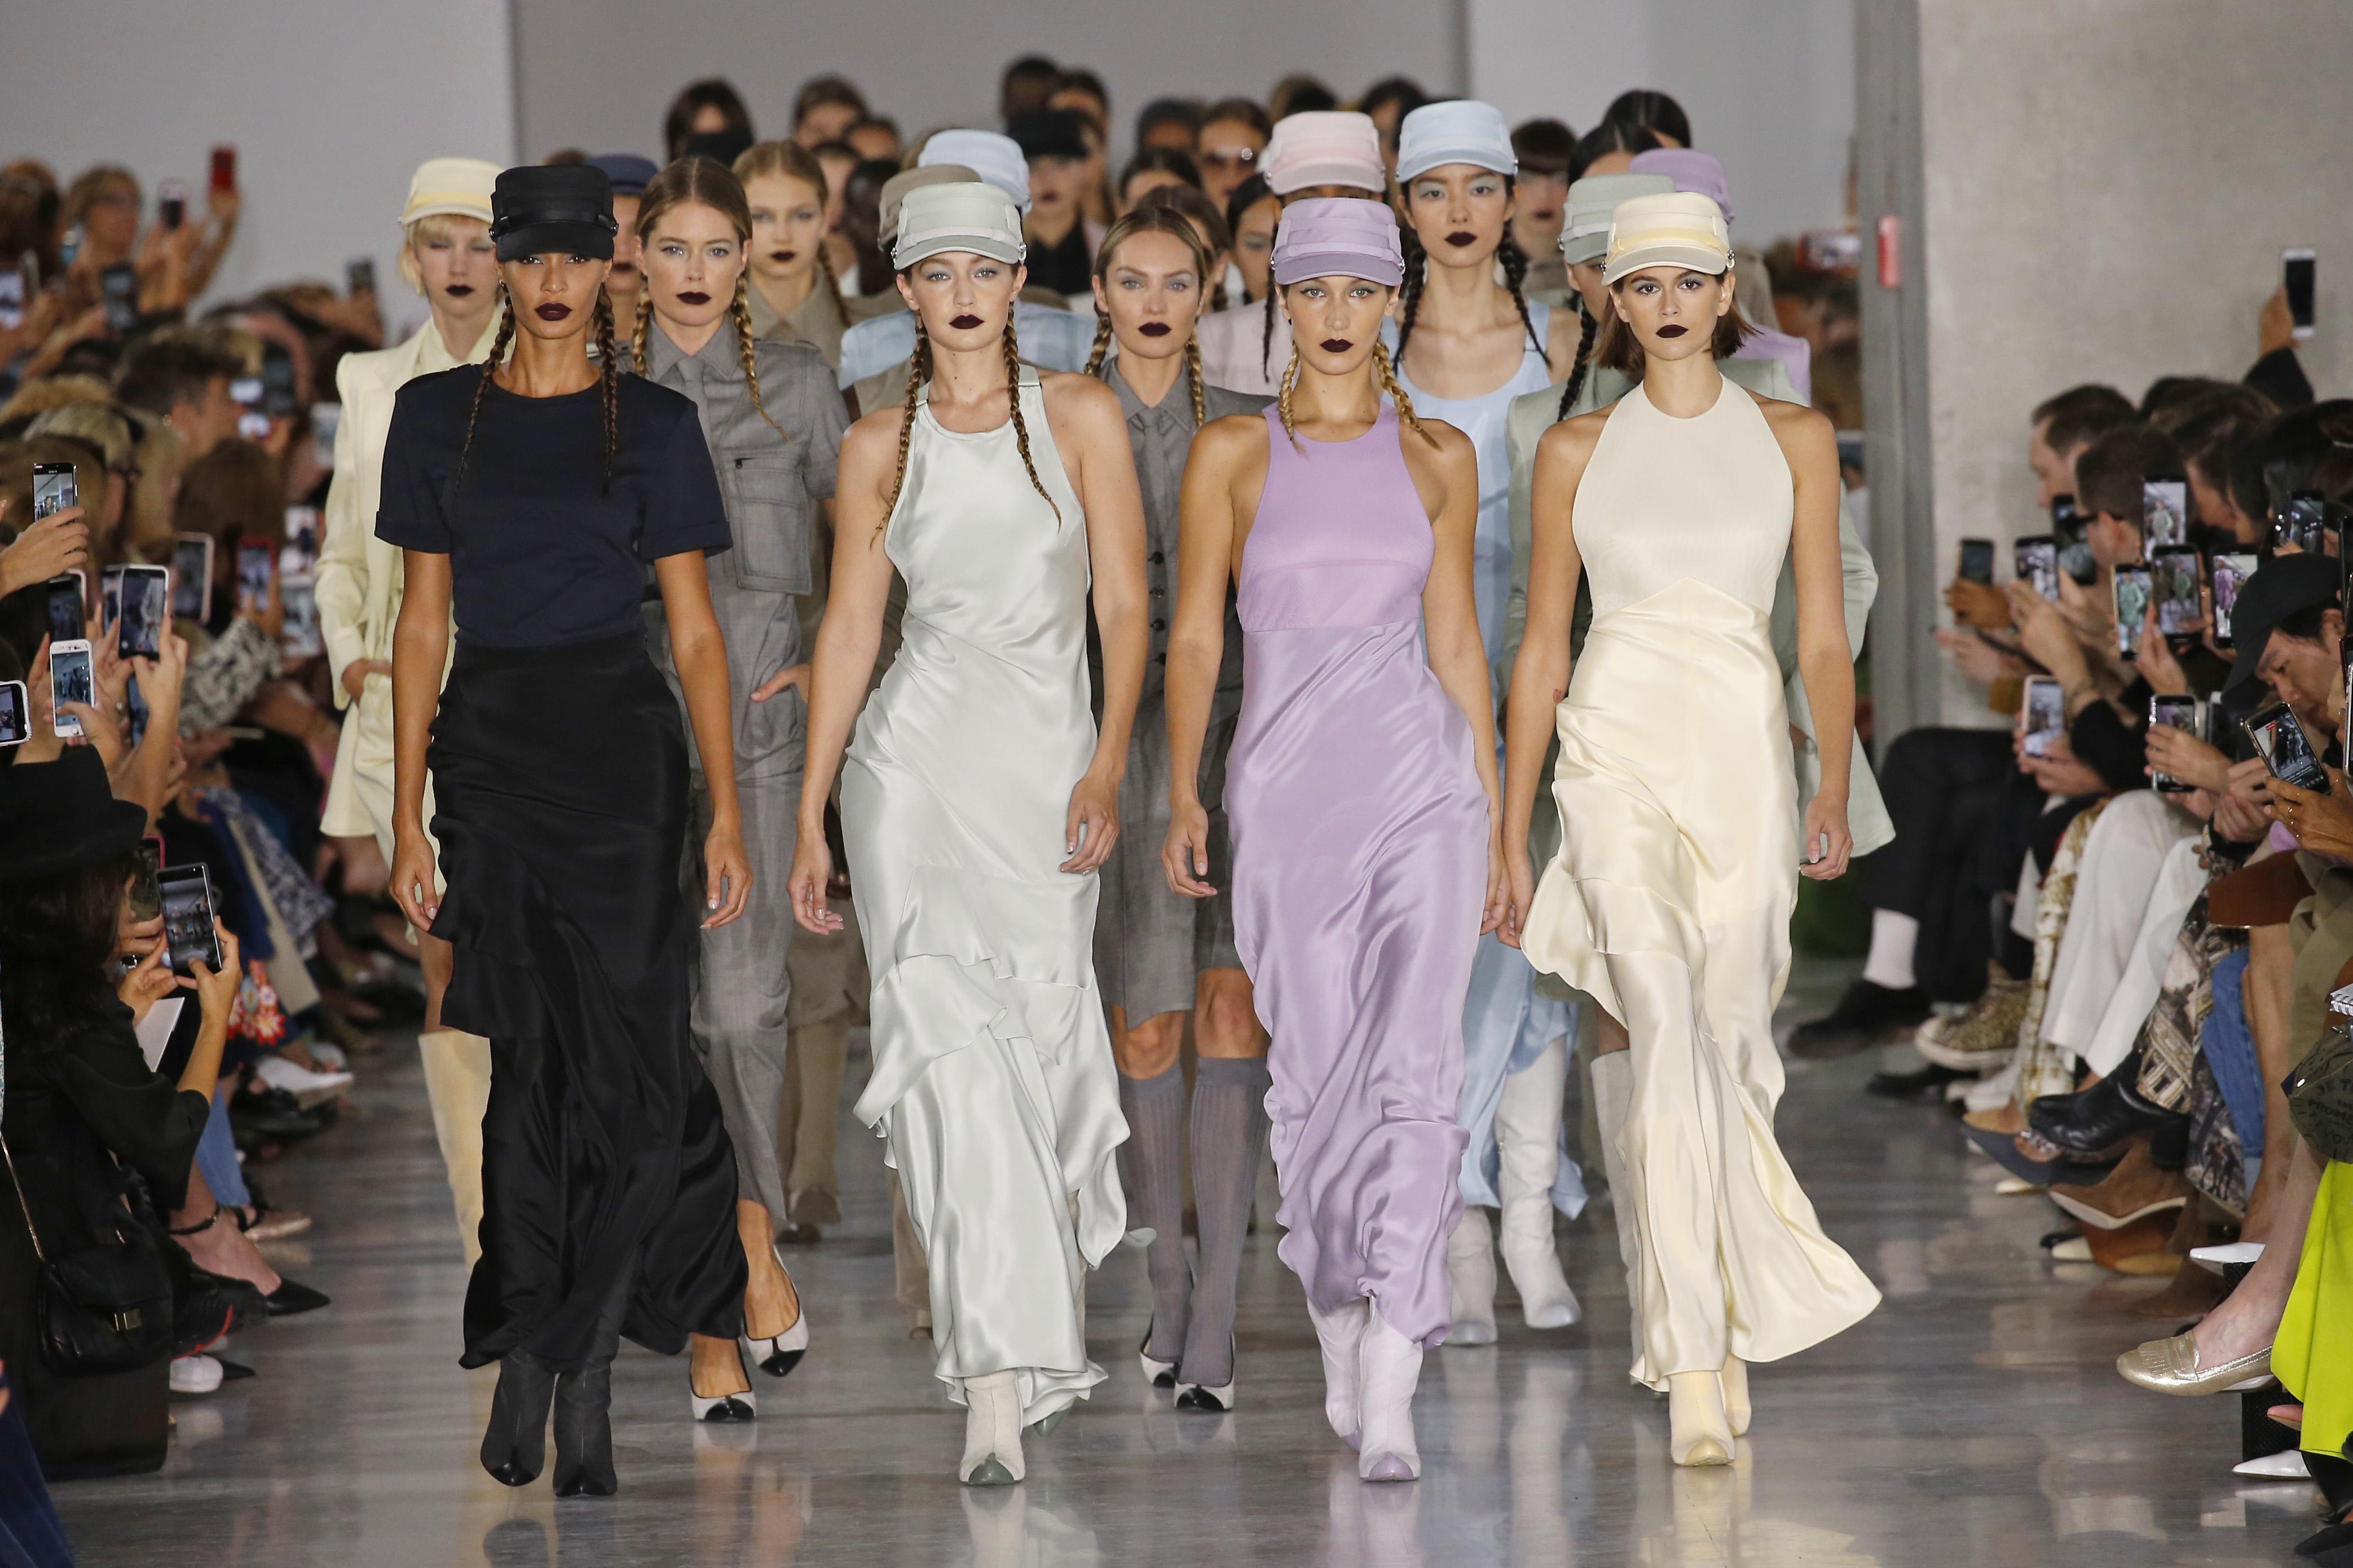 Joan Smalls, Doutzen Kroes, Gigi Hadid, Candice Swanepoel, Bella Hadid and Kaia Gerber on the catwalk